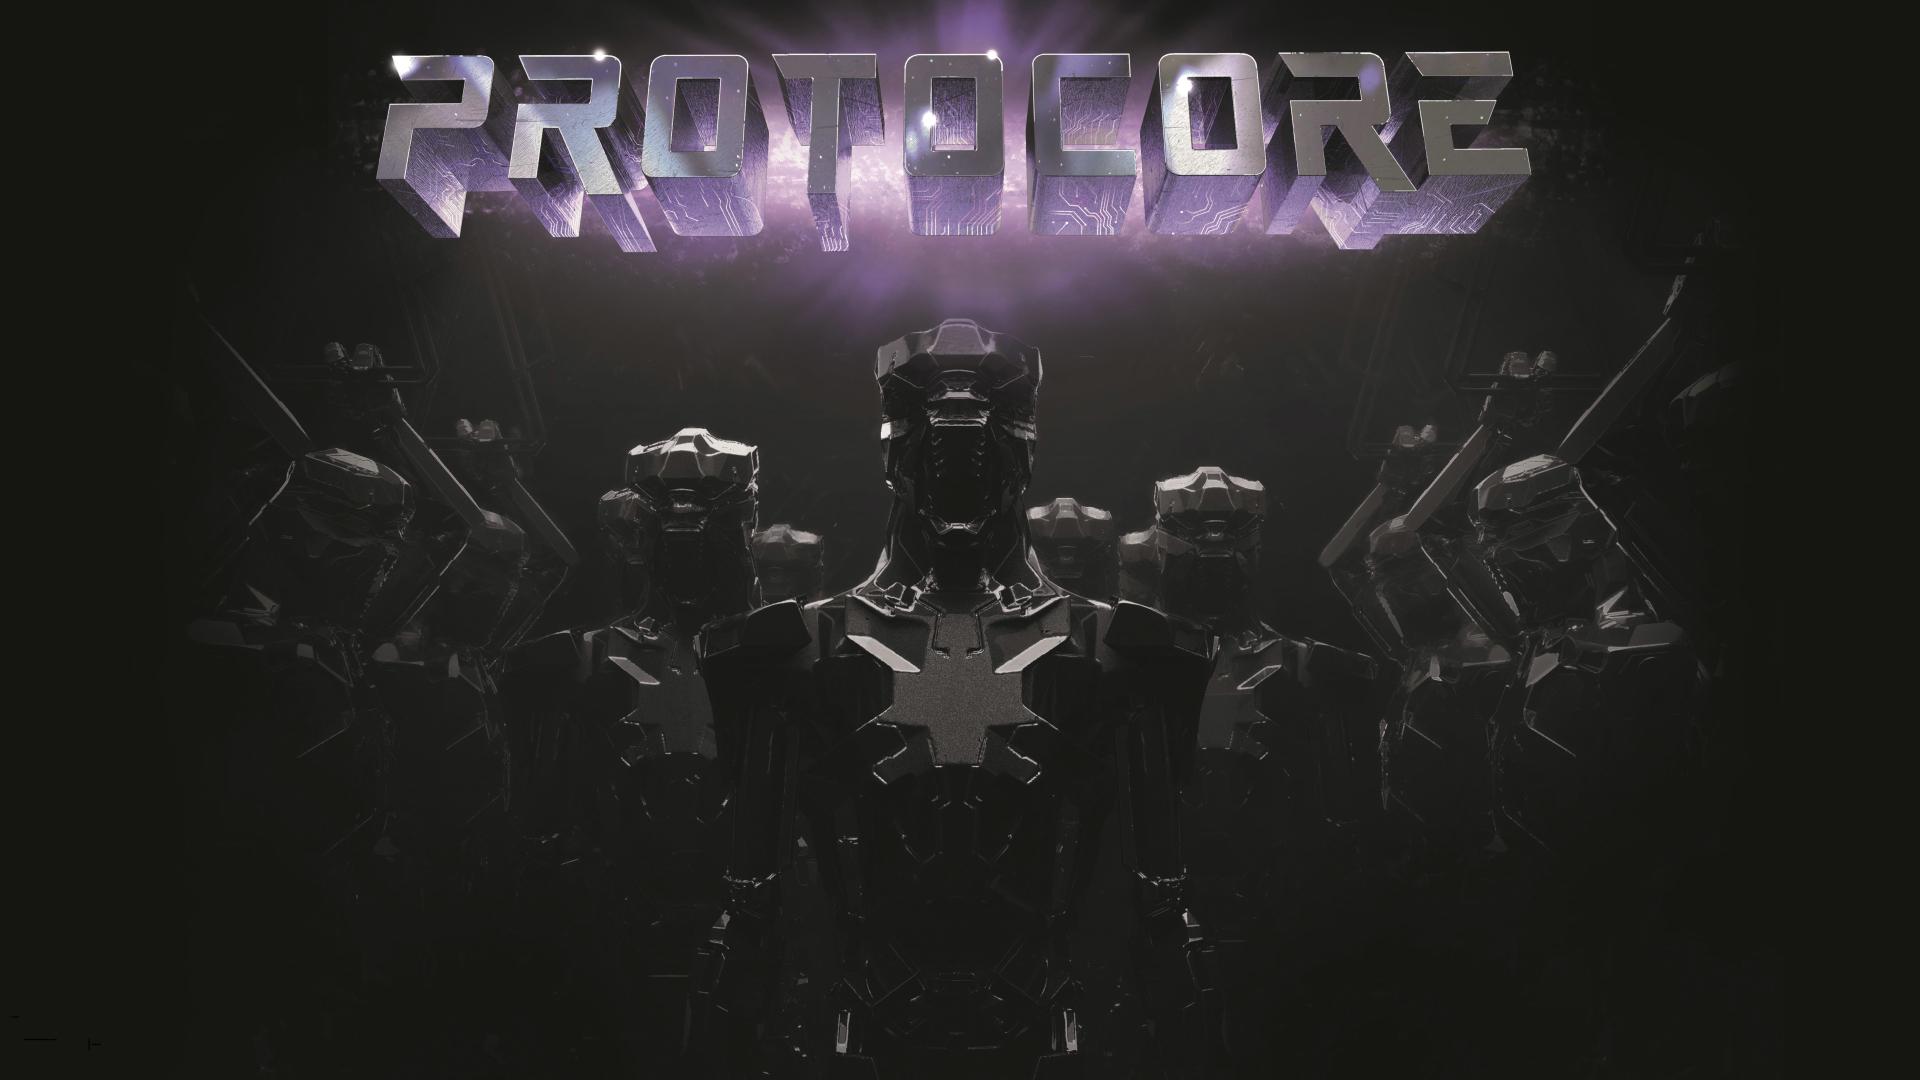 1920x1080 Protocore Game Poster 4k 1080p Laptop Full Hd